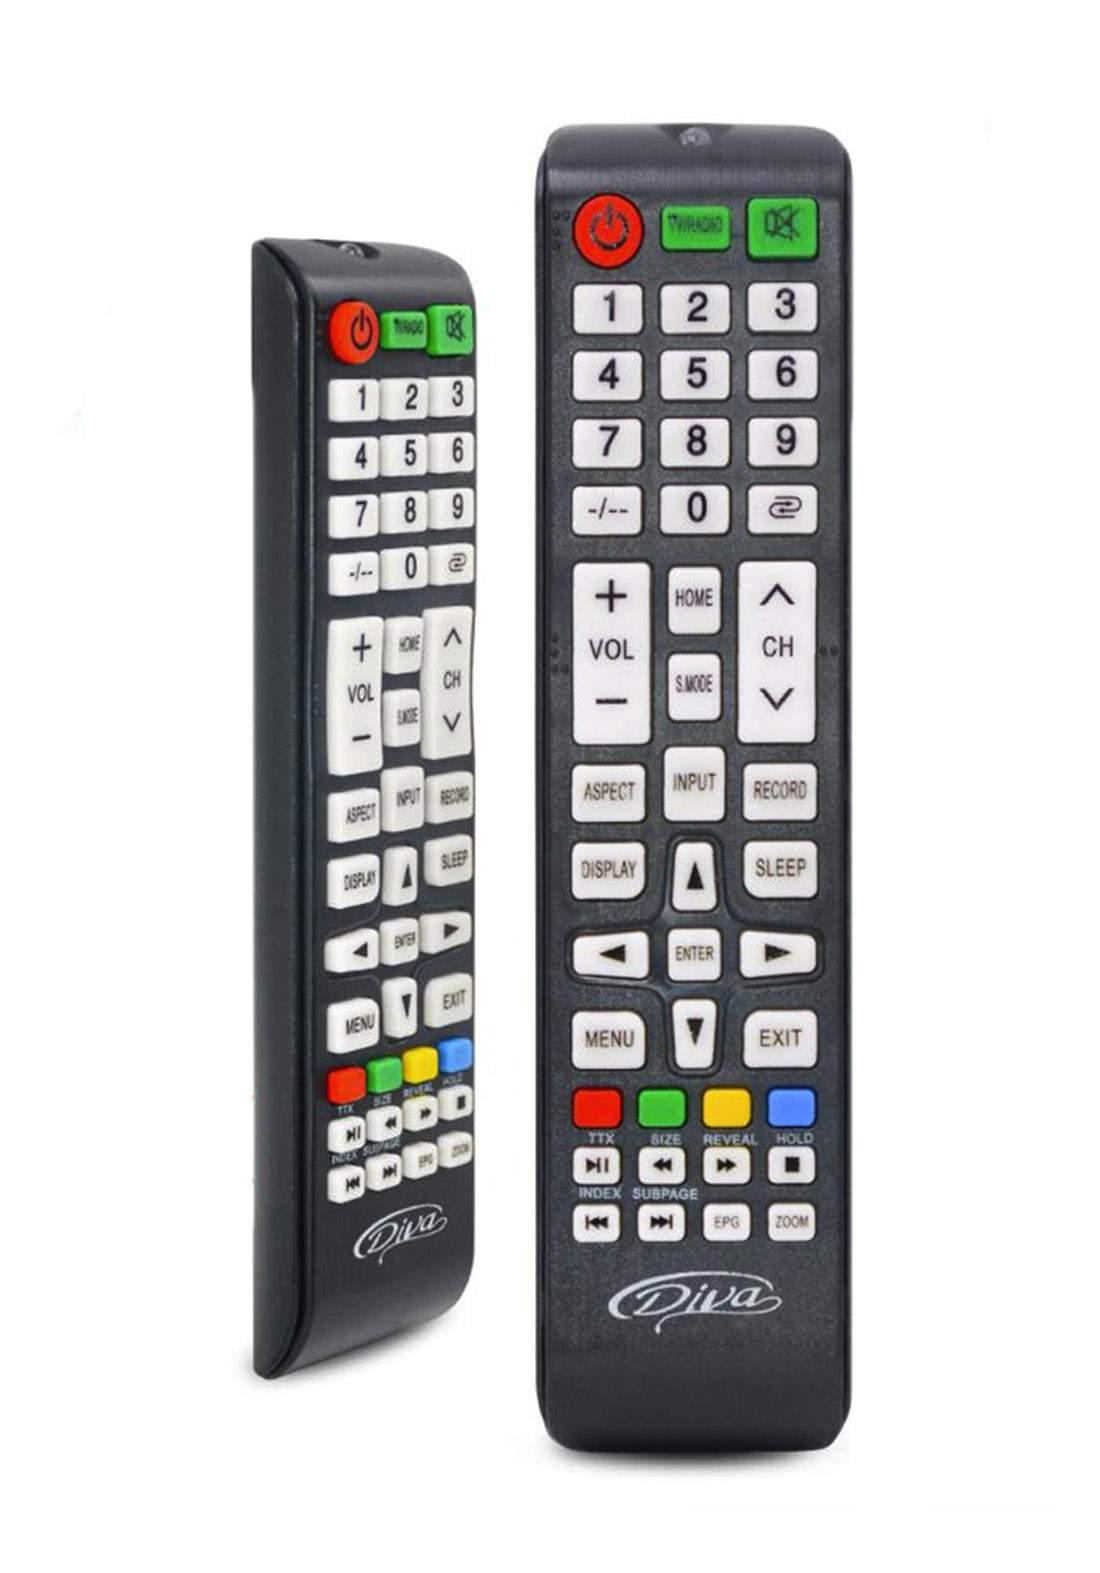 Remote Control For Diva Plasma TV (B-031) جهاز تحكم عن بعد